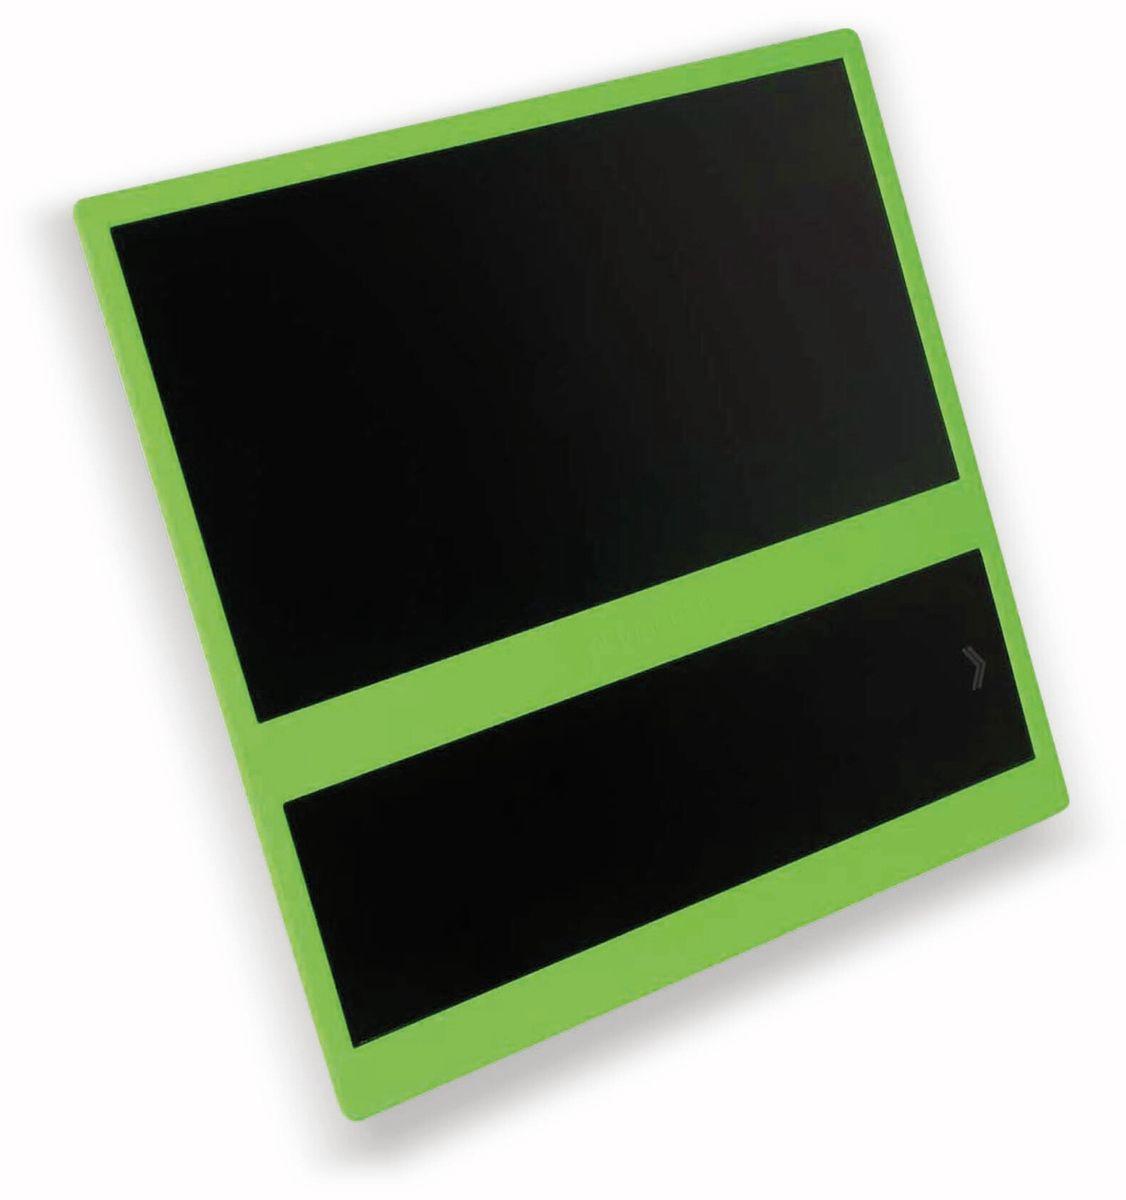 Pitop Ceed Grün für Raspberry Pi 3 B